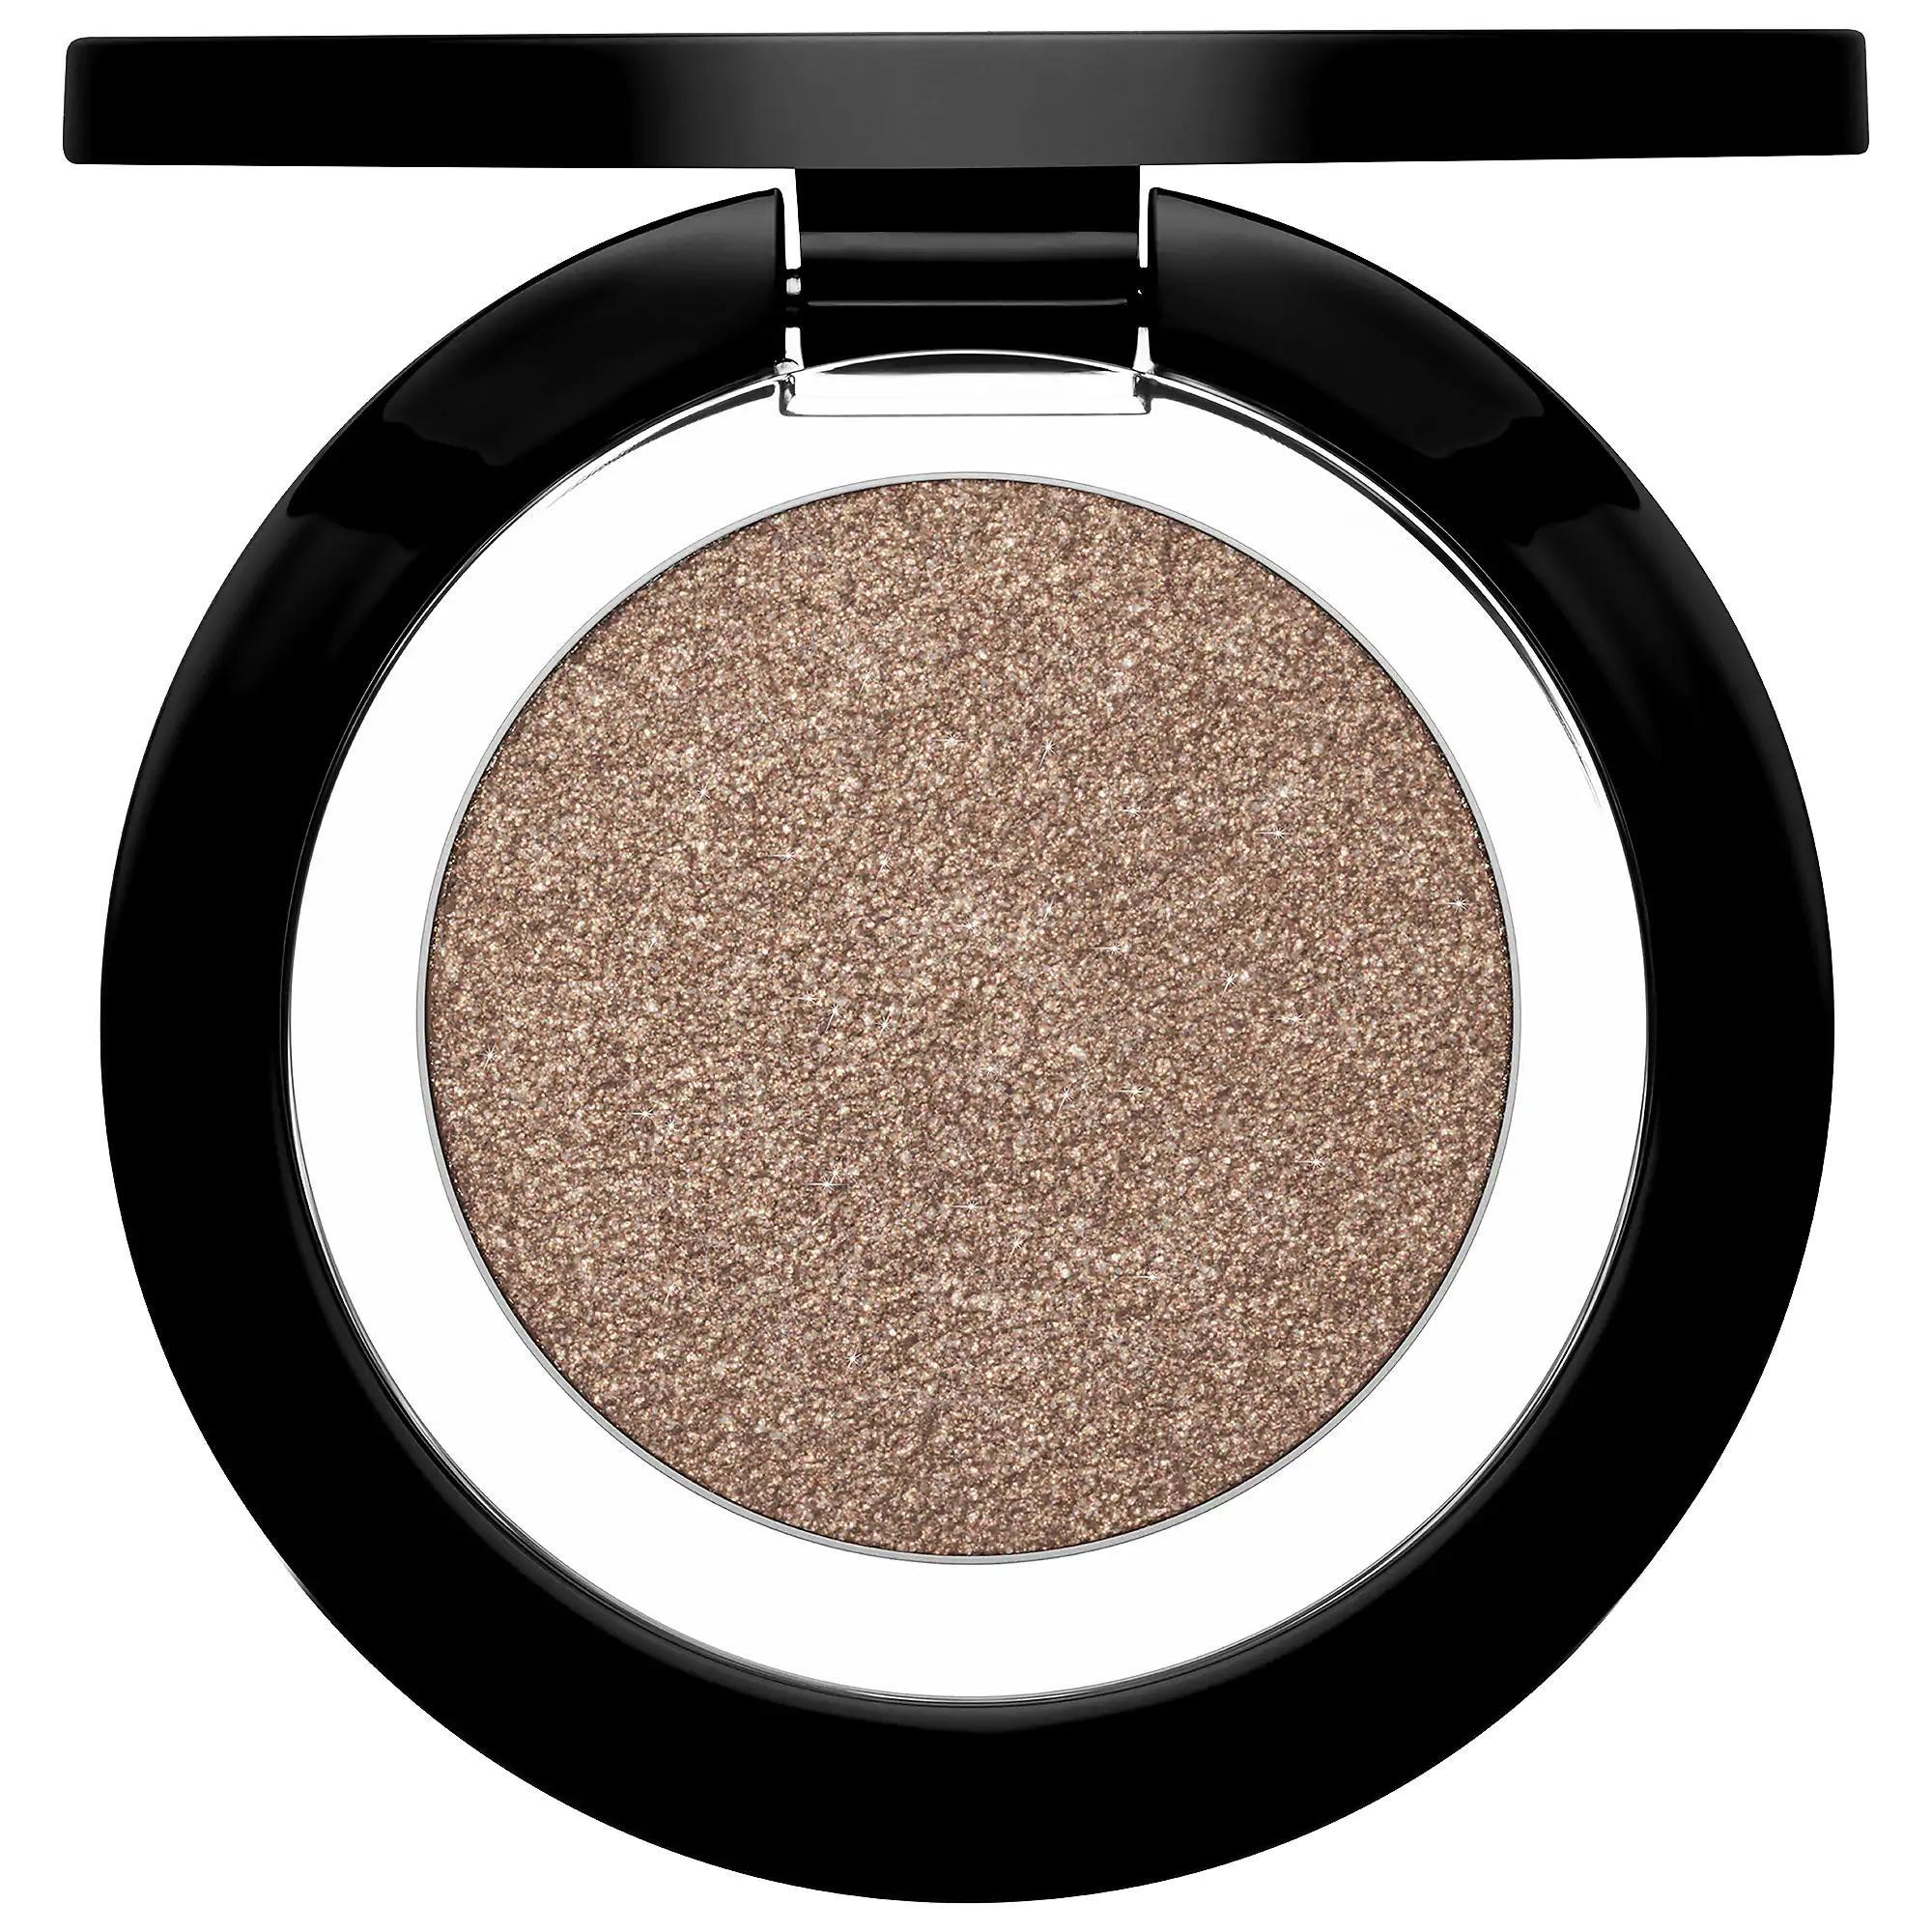 Pat McGrath Labs EYEdols Eyeshadow Sextrovert